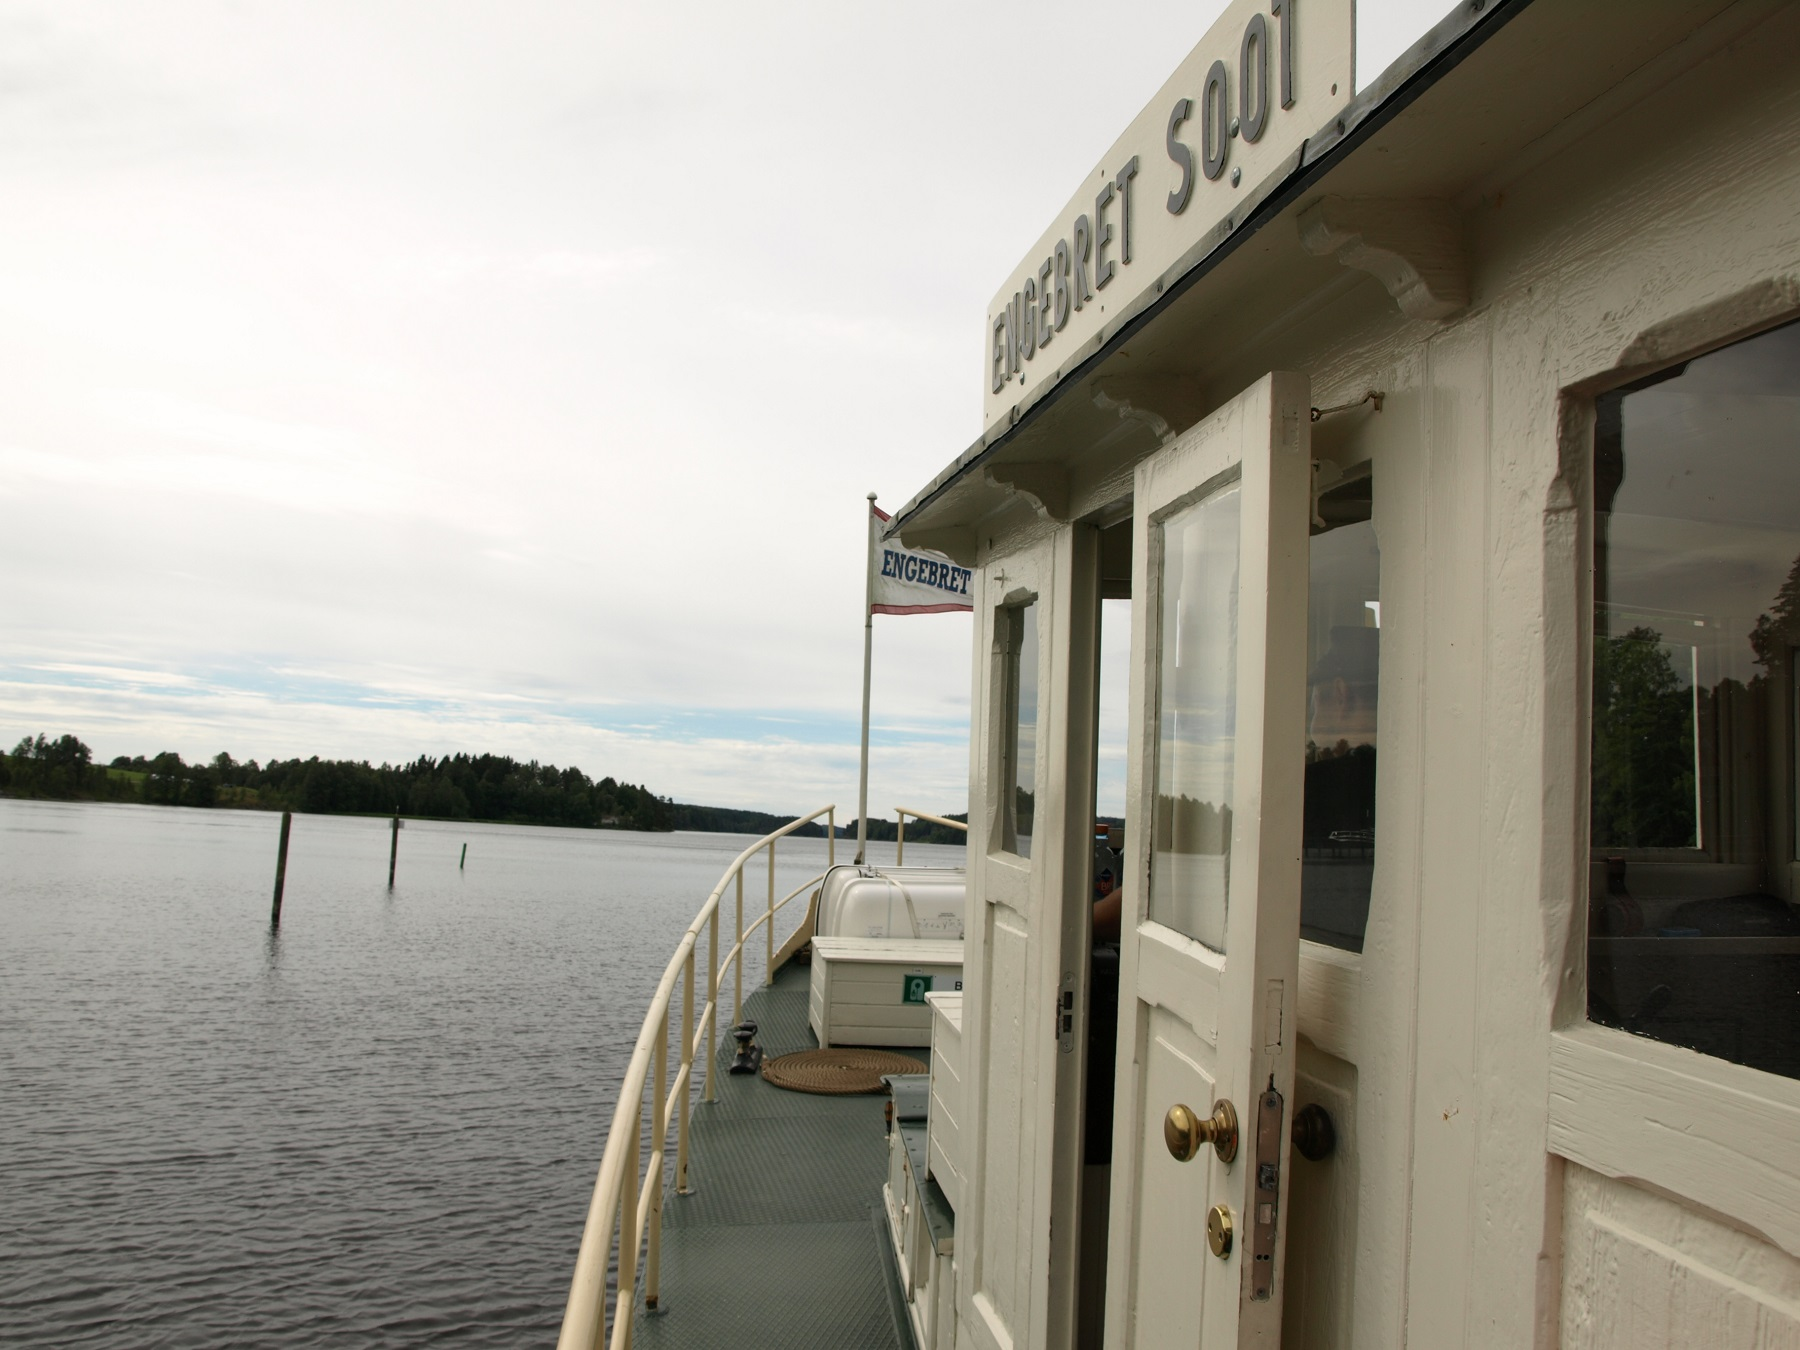 Nedover Lifjorden sør for Ørje. Foto: Bodil Andersson, Østfoldmuseene Halden historiske Samlinger